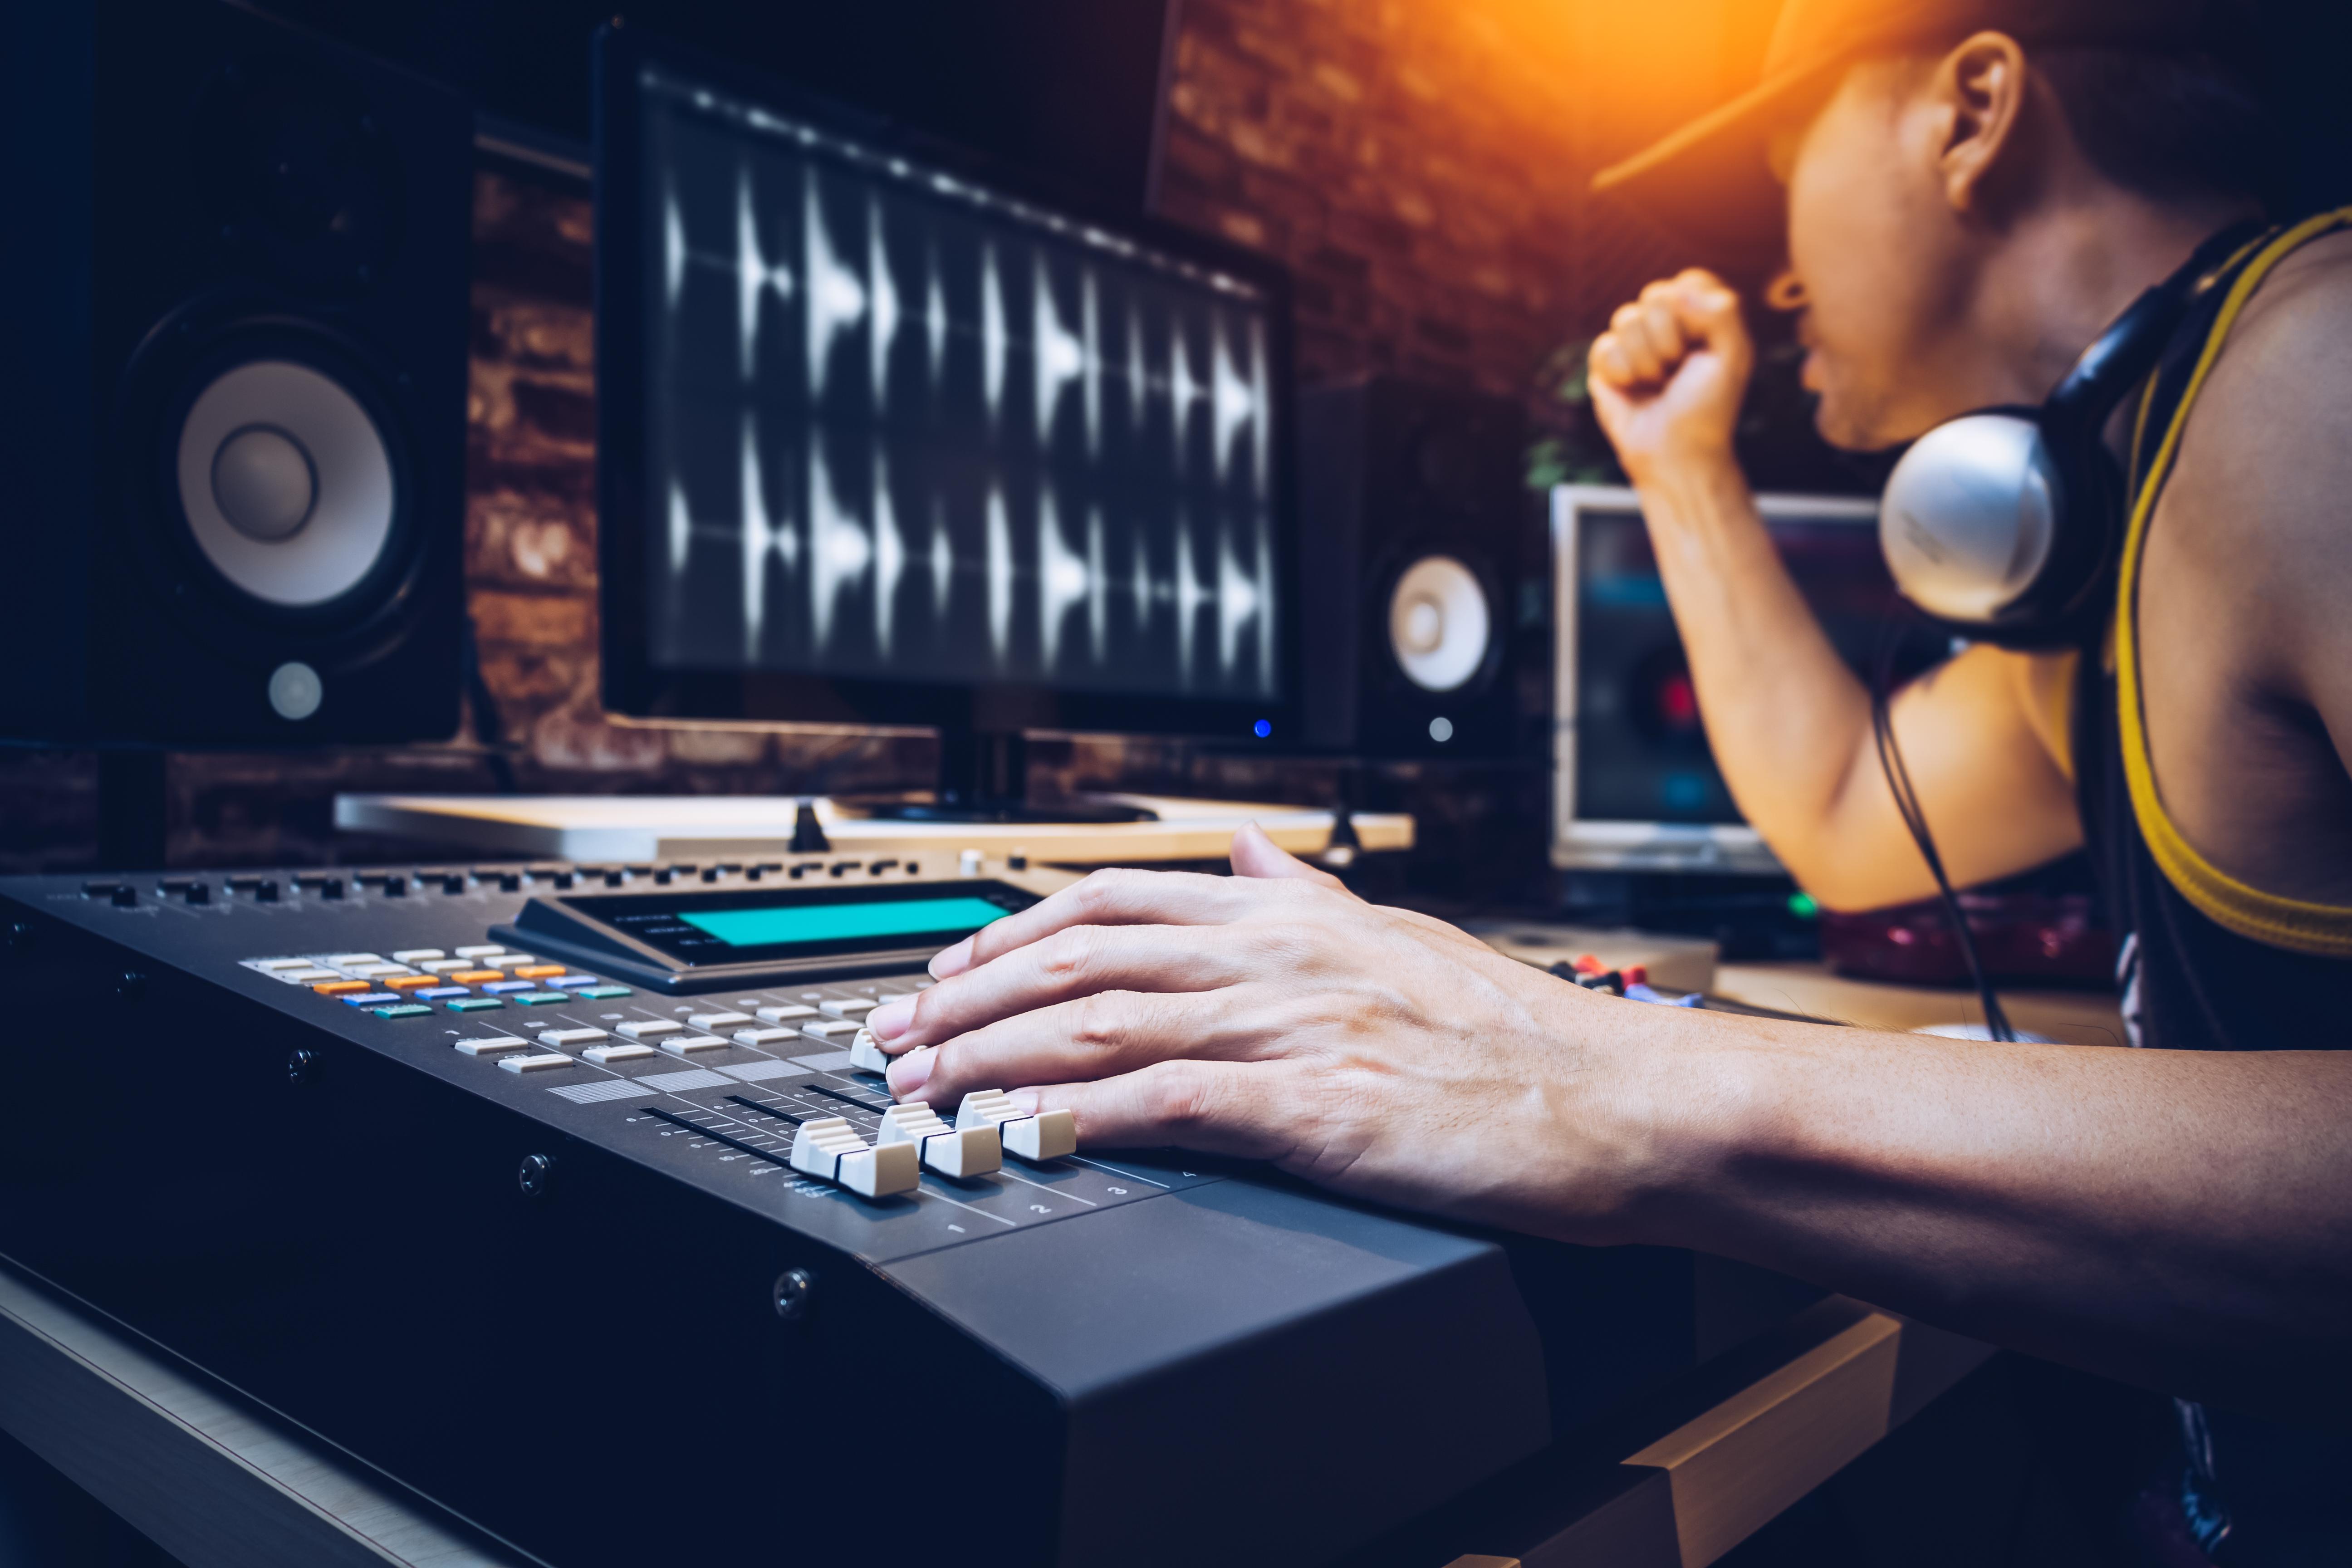 popular DJ working in radio broadcasting studio or music producer working in recording studio